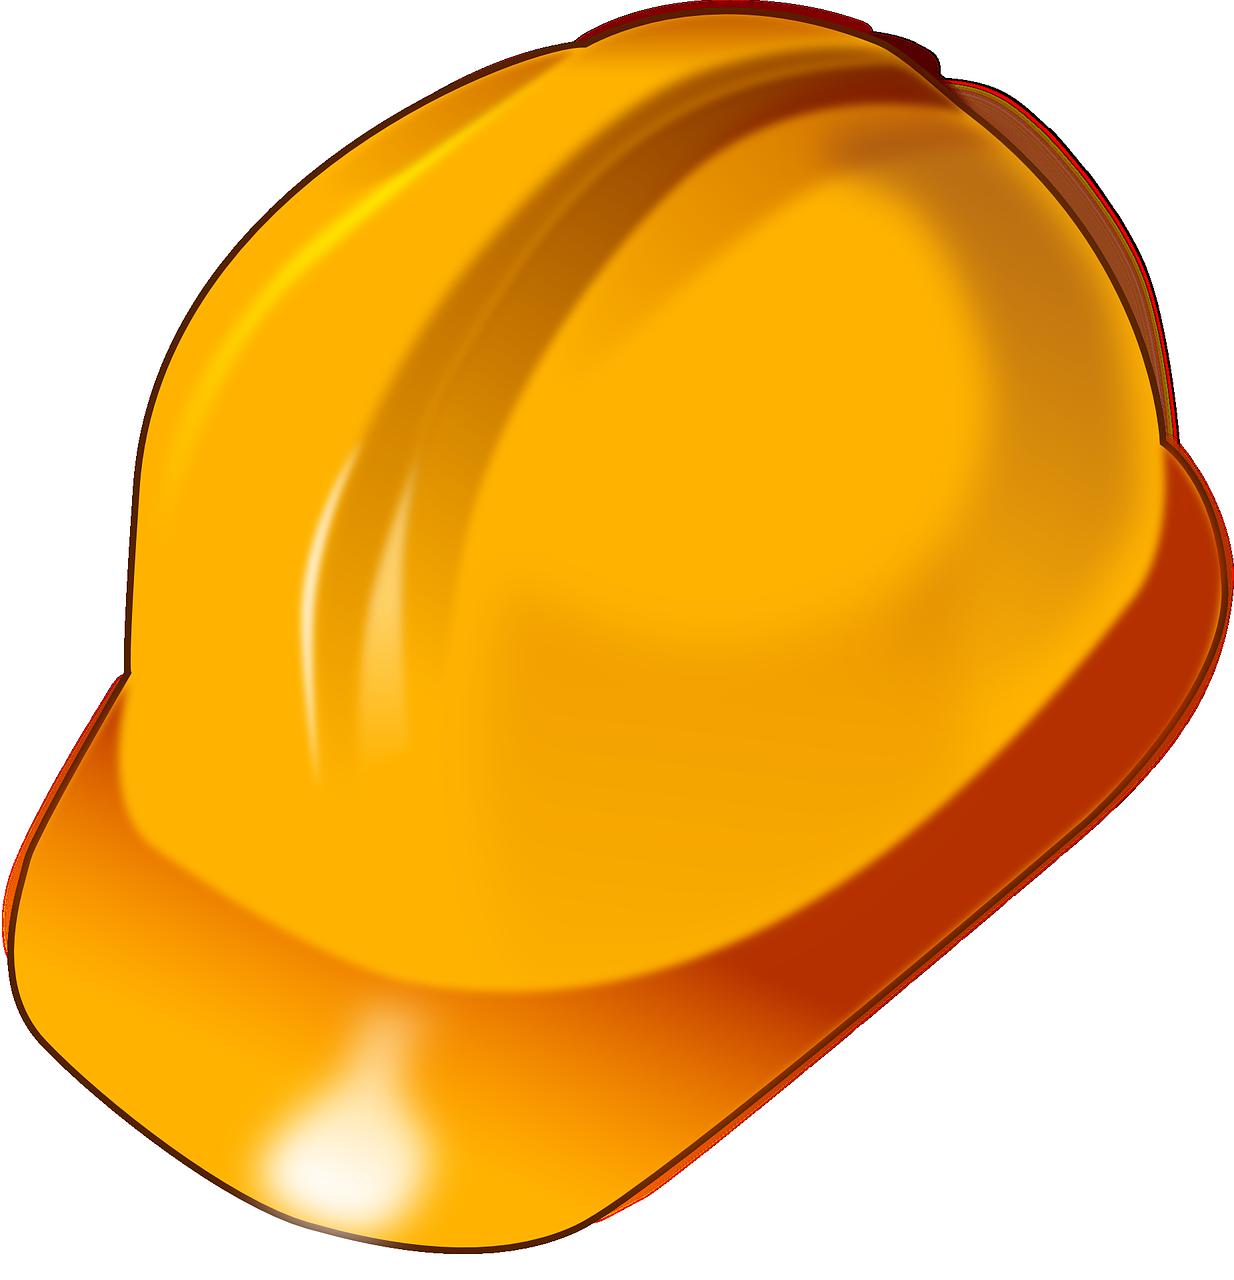 Working helmet clipart clip art transparent Free Image on Pixabay - Safety Helmet, Helmet, Safe, Work | NCLHDA ... clip art transparent